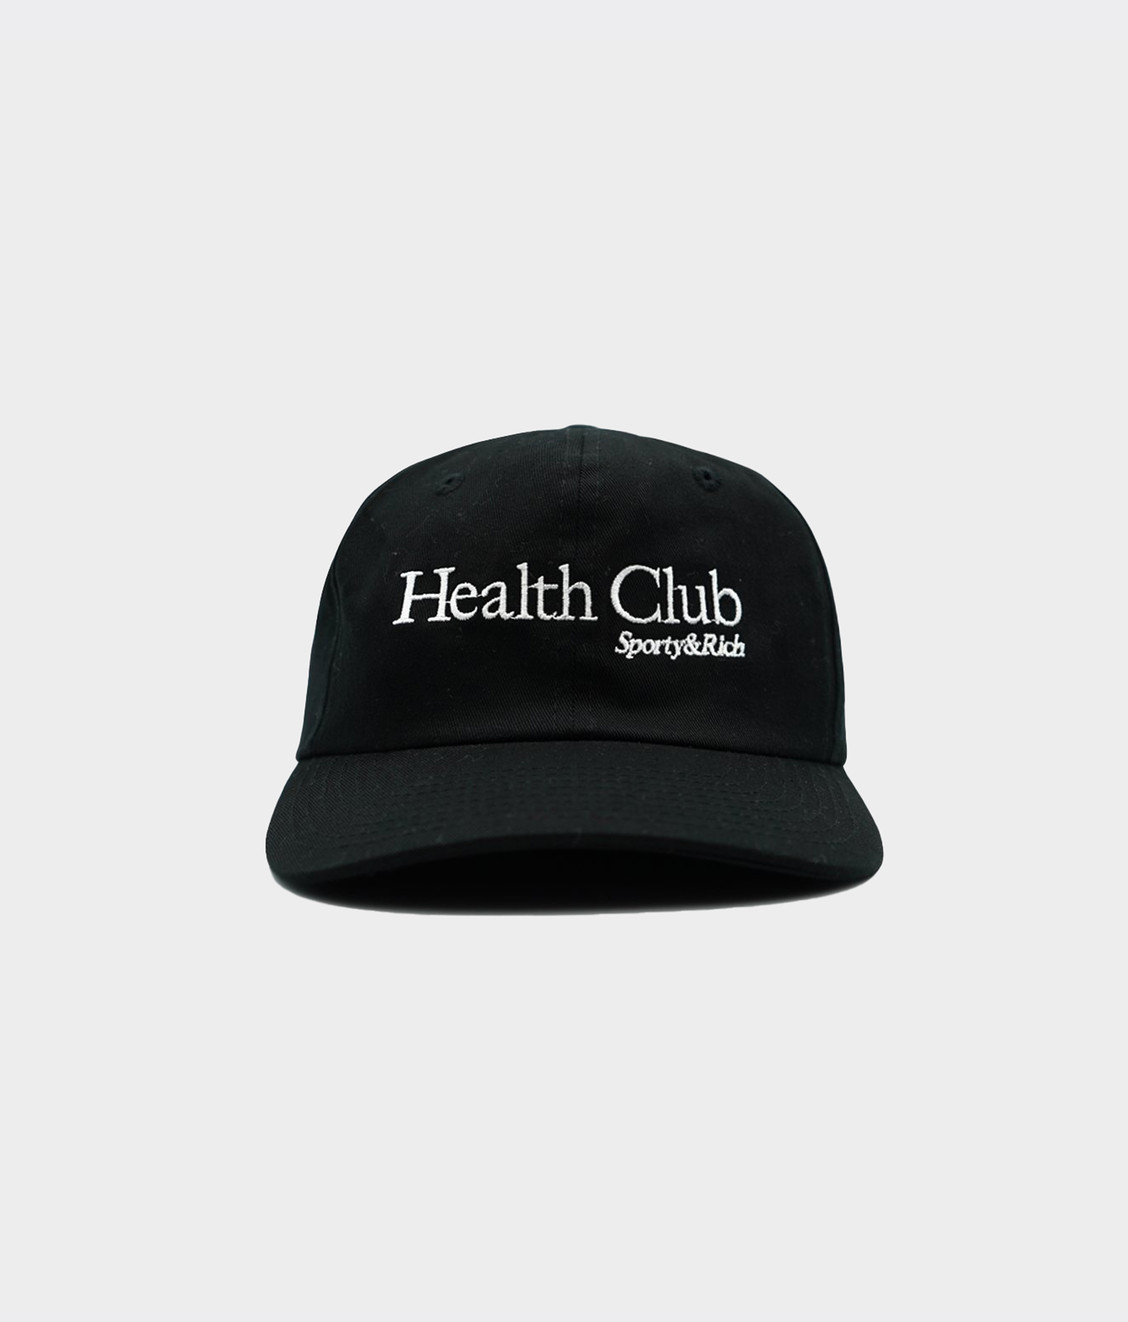 Sporty and Rich Sporty & Rich Health Club Hat Black